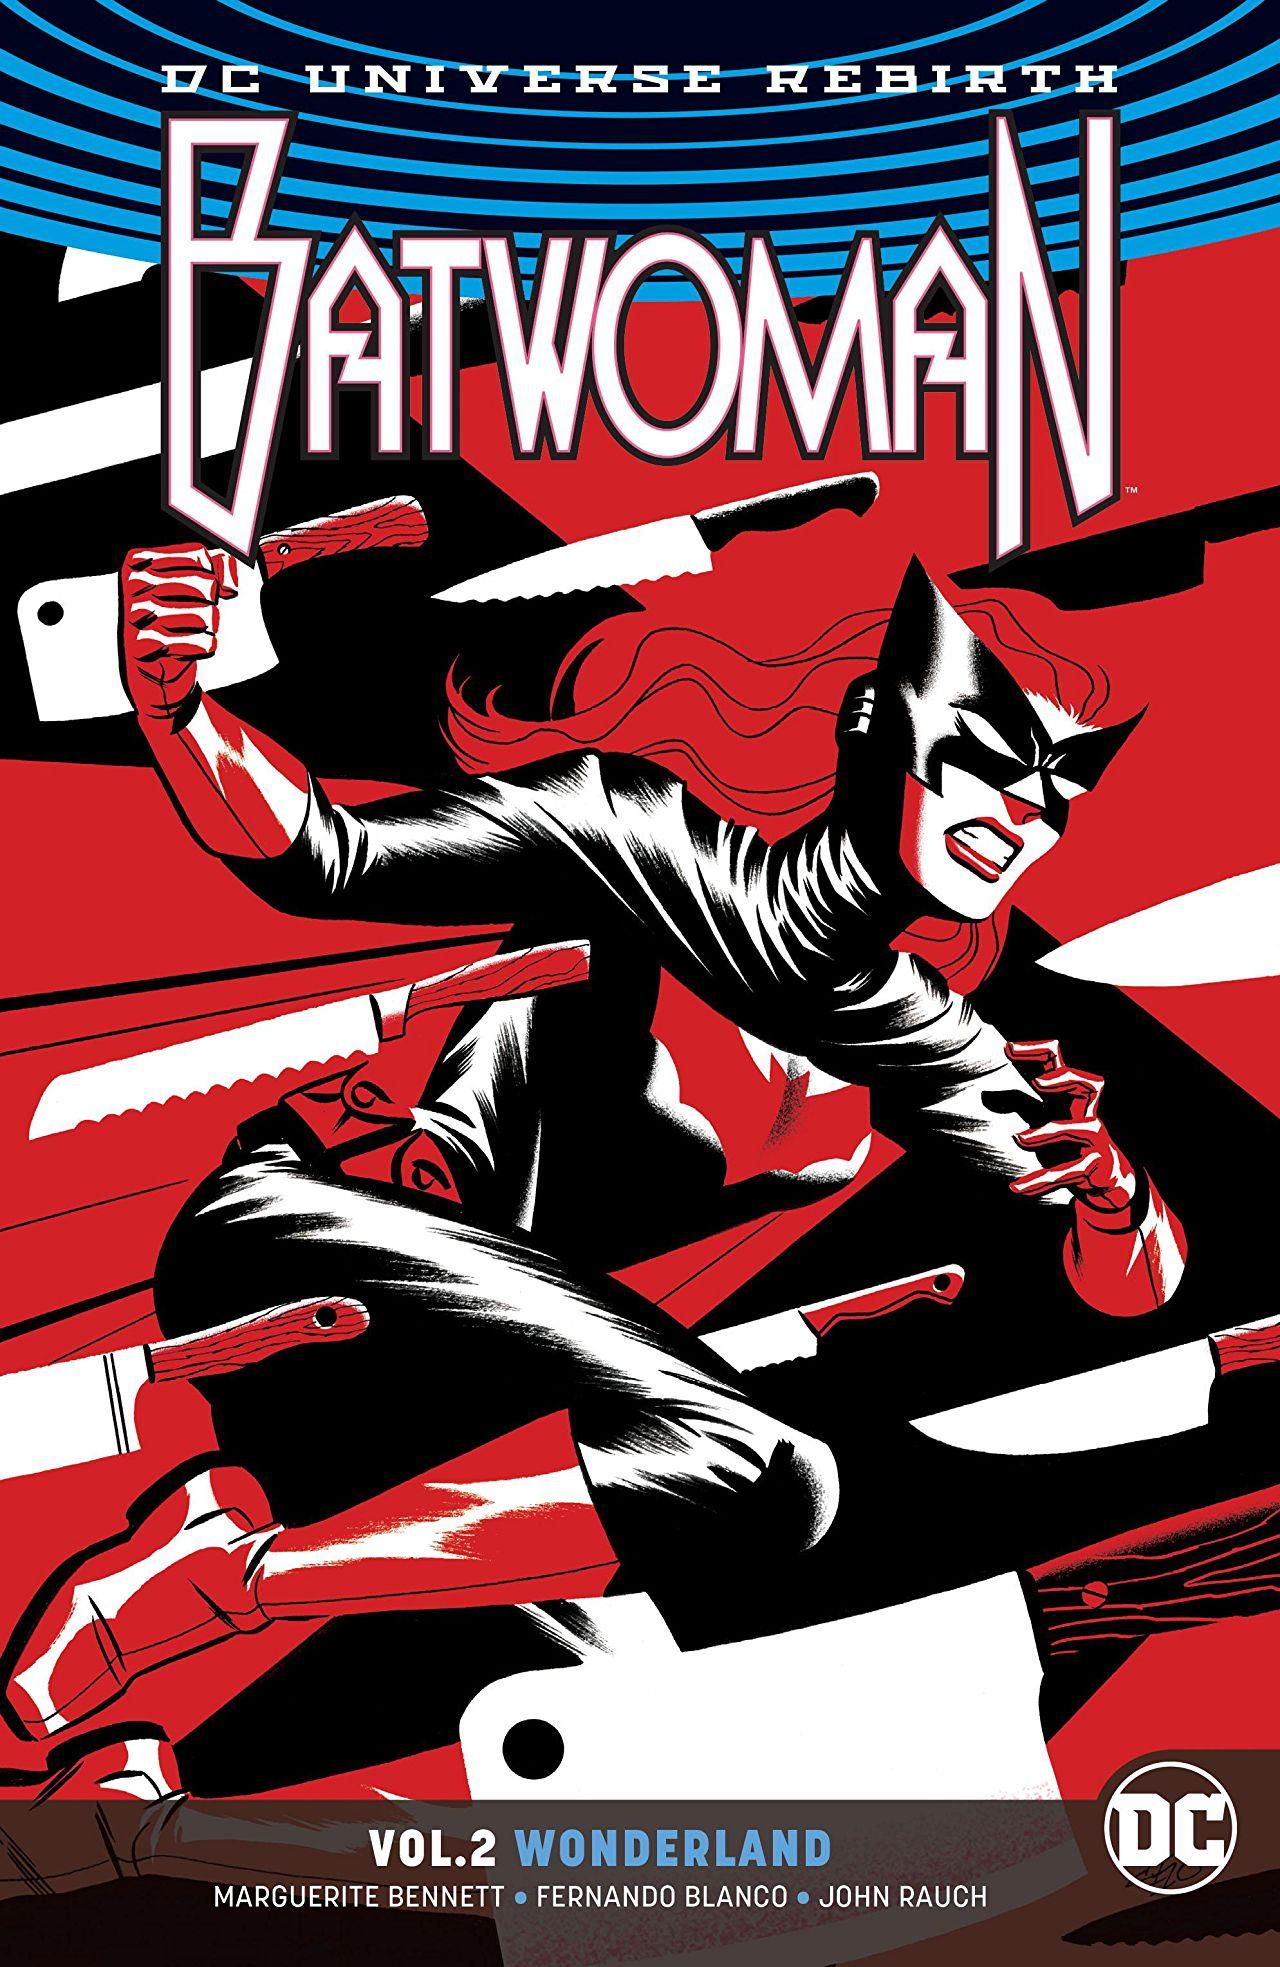 2019 GLAAD Media Awards Nominees: Batwoman Vol. 2, Wonderland